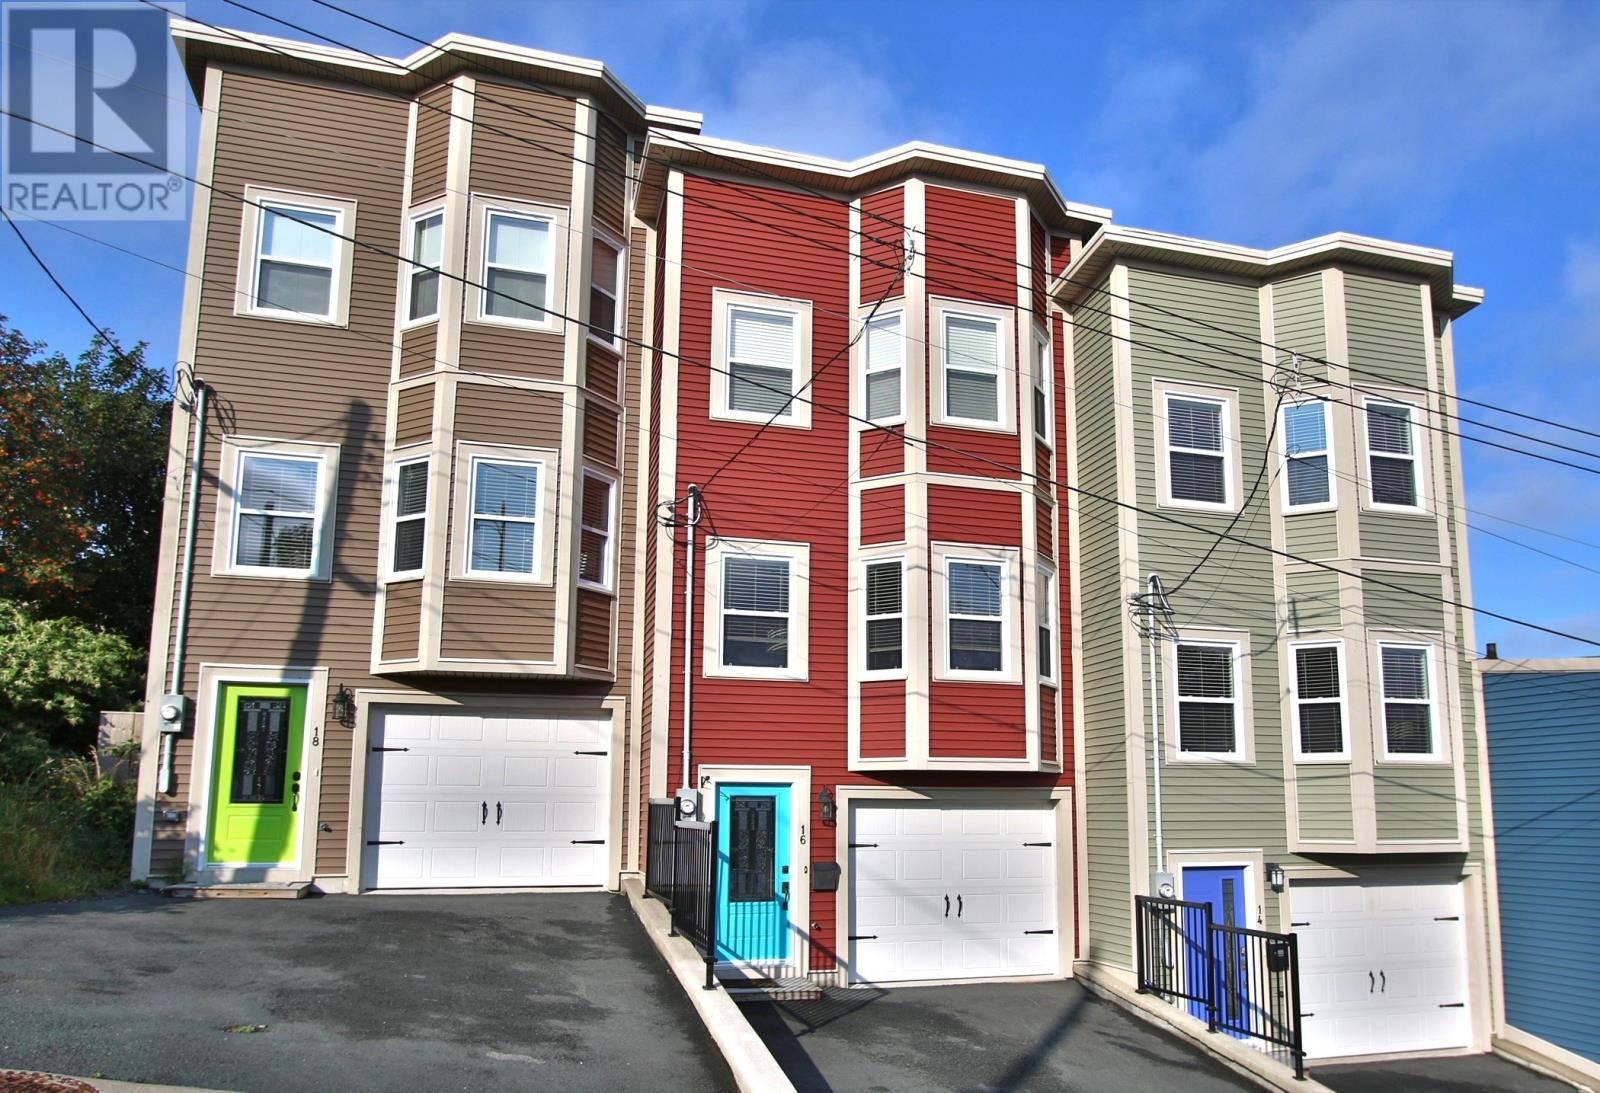 House for sale at 18 Stephen Pl St. John's Newfoundland - MLS: 1206894